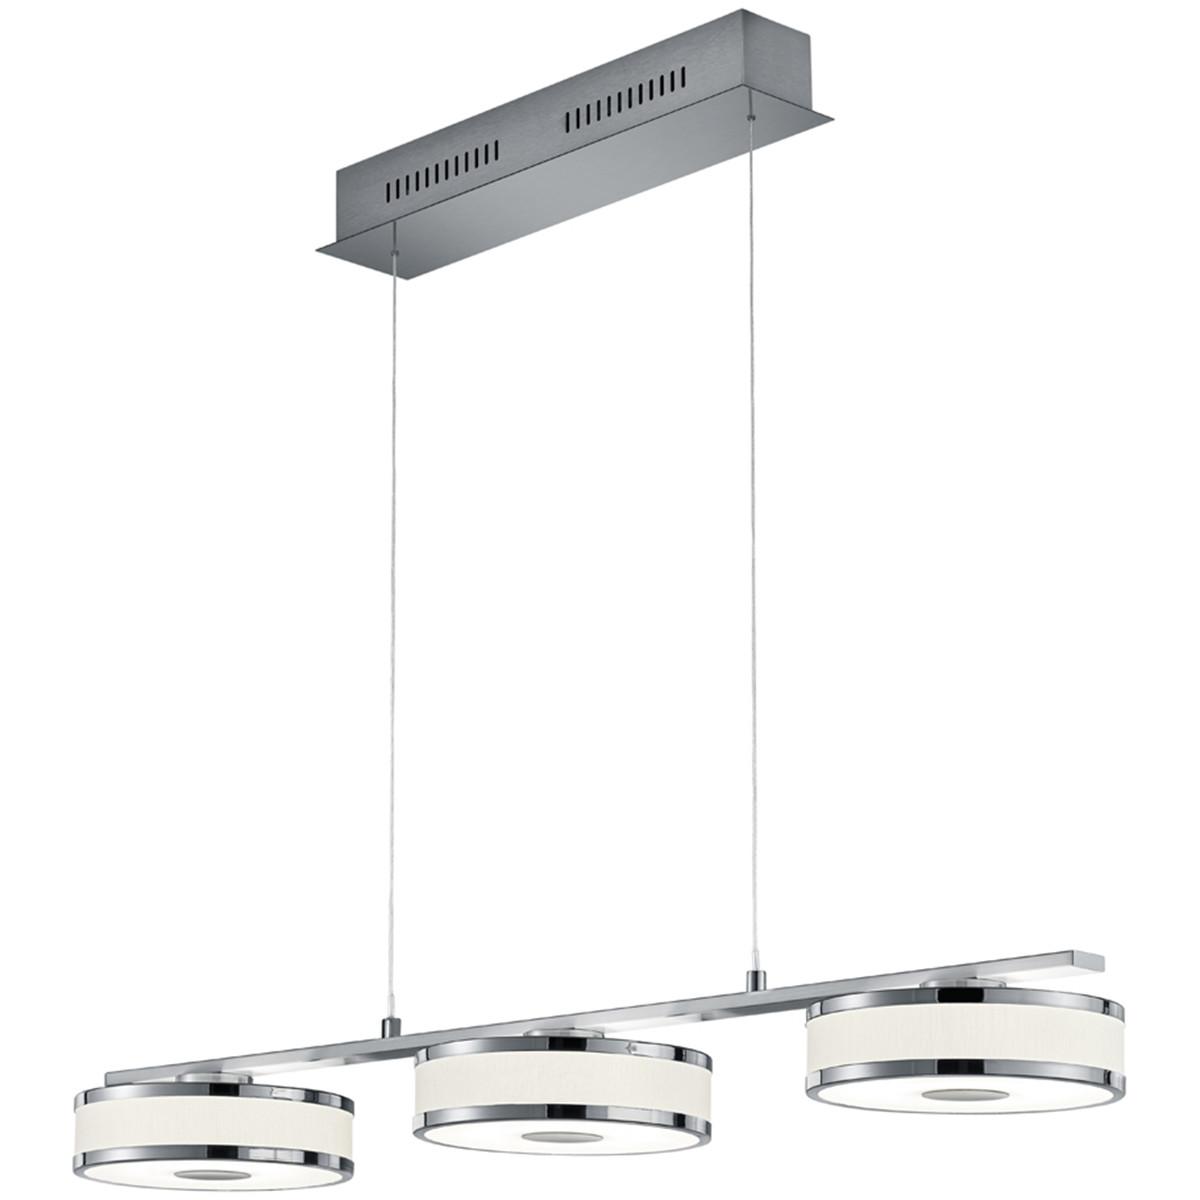 LED Hanglamp - Trion Agiany - 21W - Warm Wit 3000K - 3-lichts - Dimbaar - Rechthoek - Mat Nikkel - A